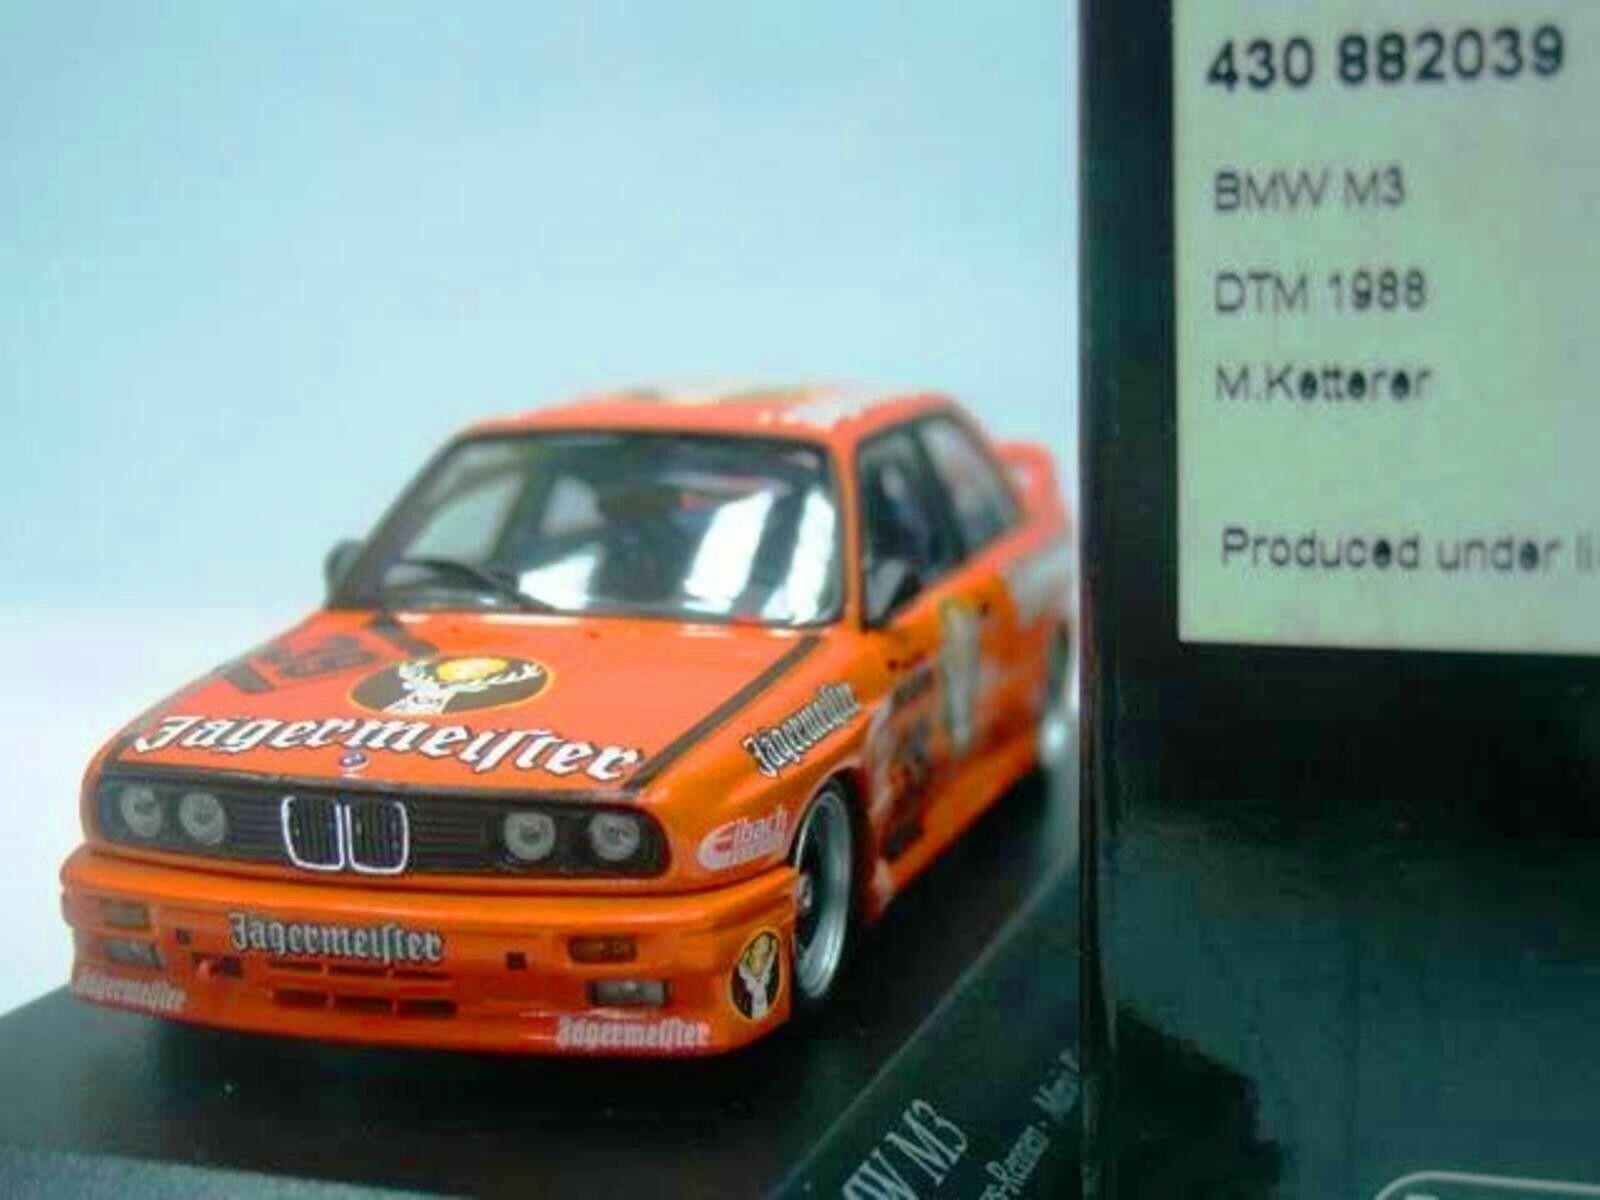 Wow extremadonnate raro BMW M3 E30 DTM 1988 Montpellier JAGERMEISTER 1 43 Minichamps